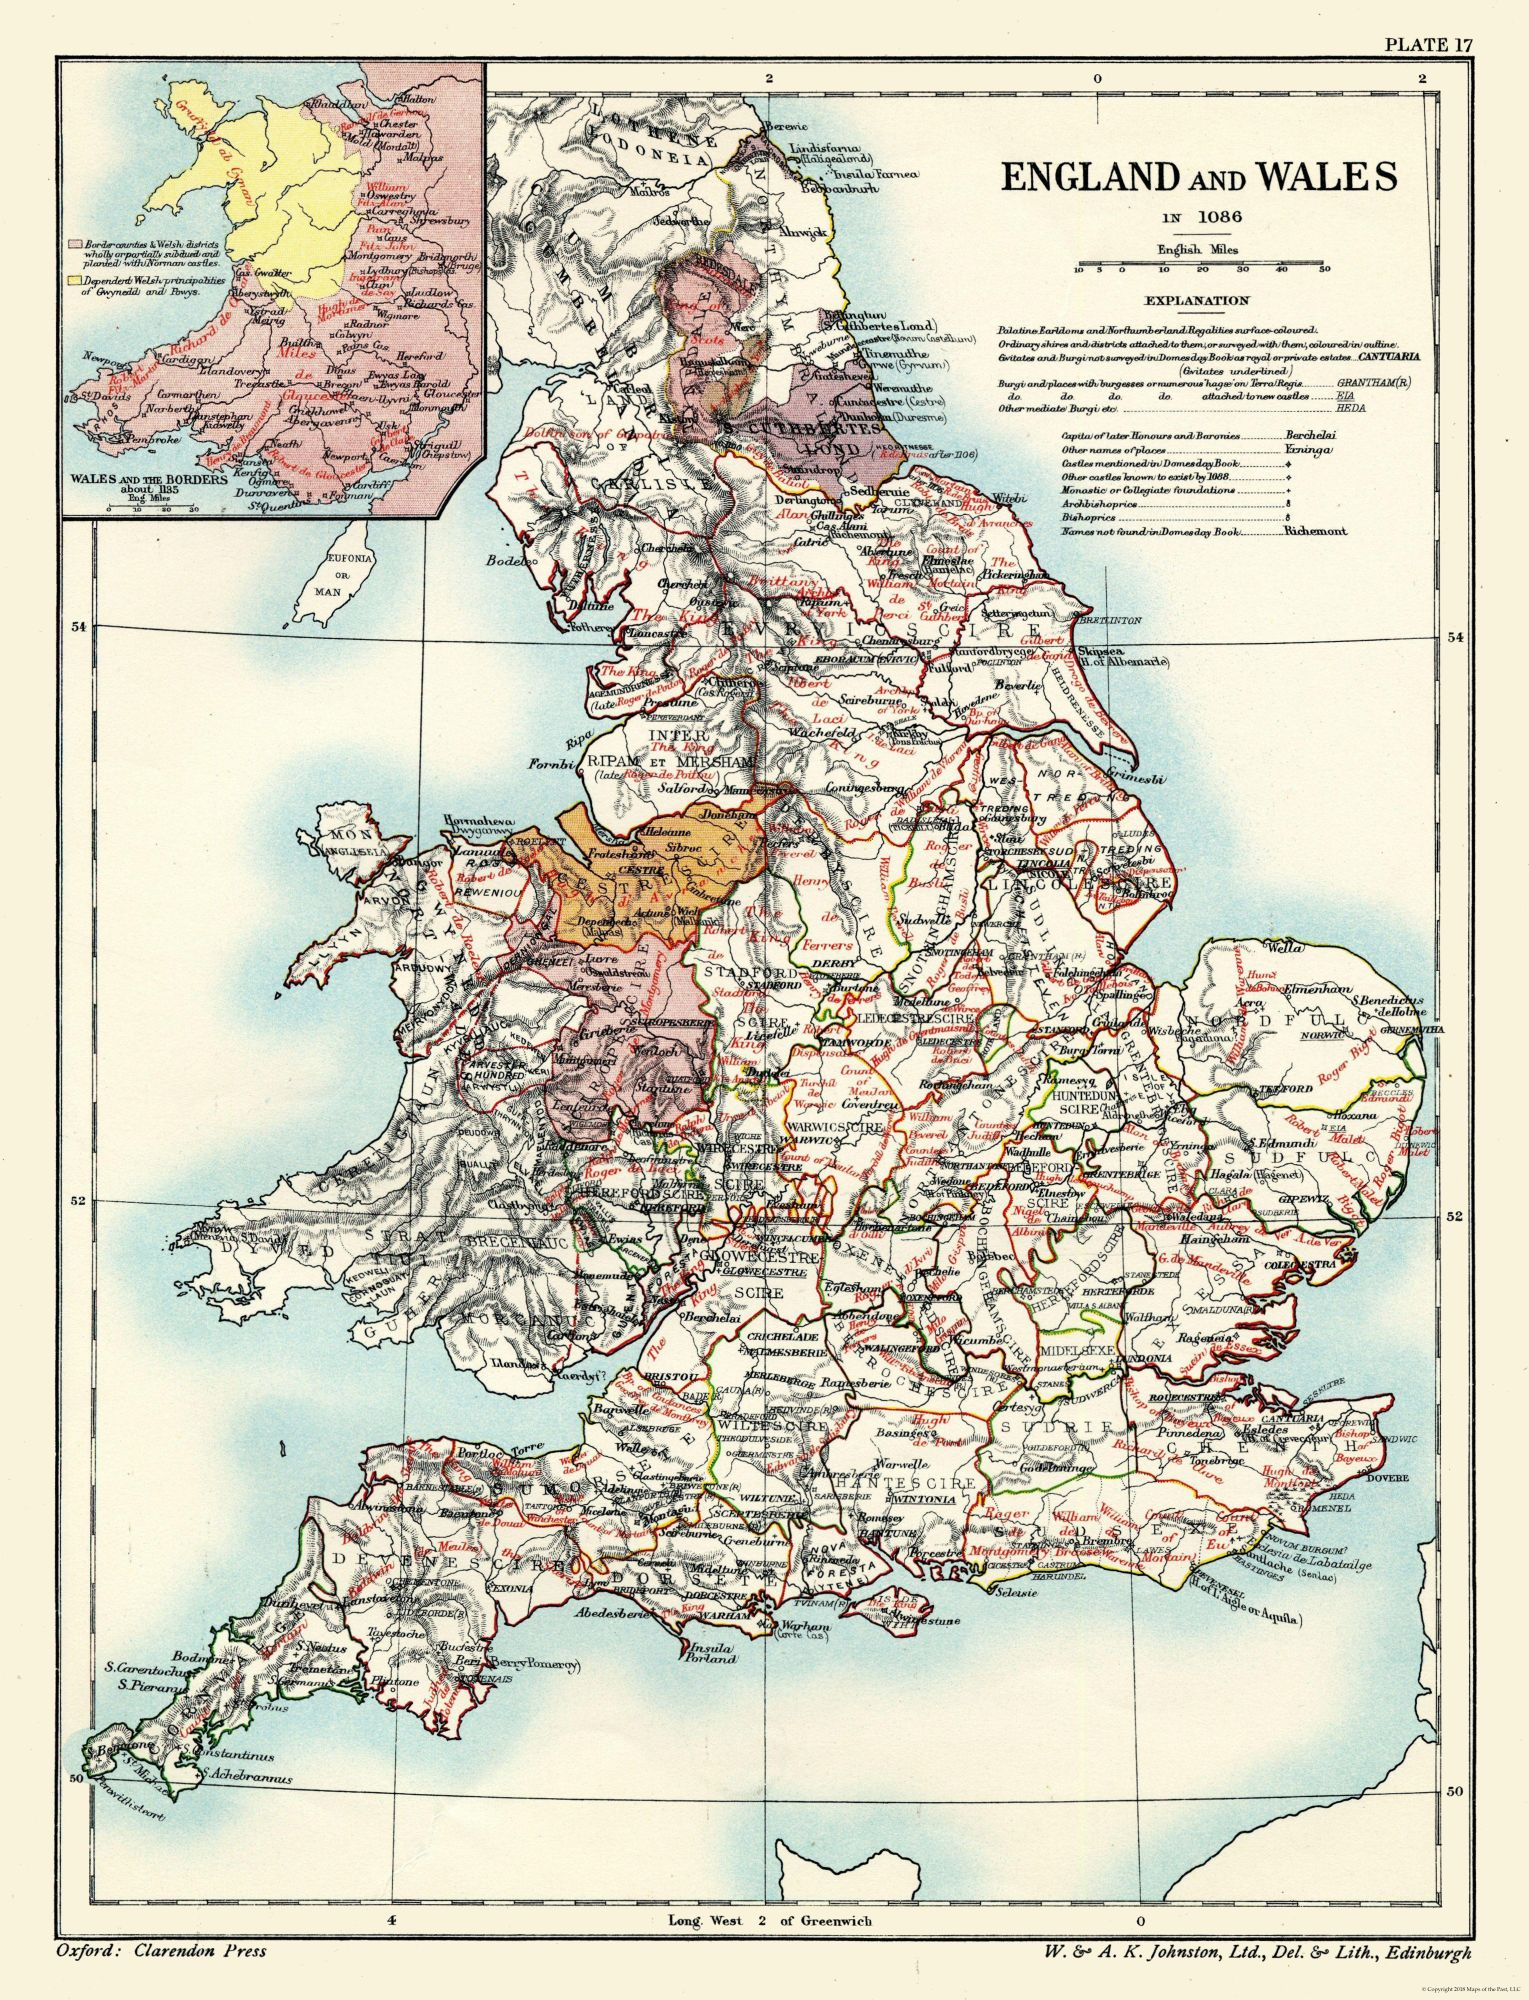 Poole England Map.Old International Maps England And Wales 1086 Poole 1902 23 X